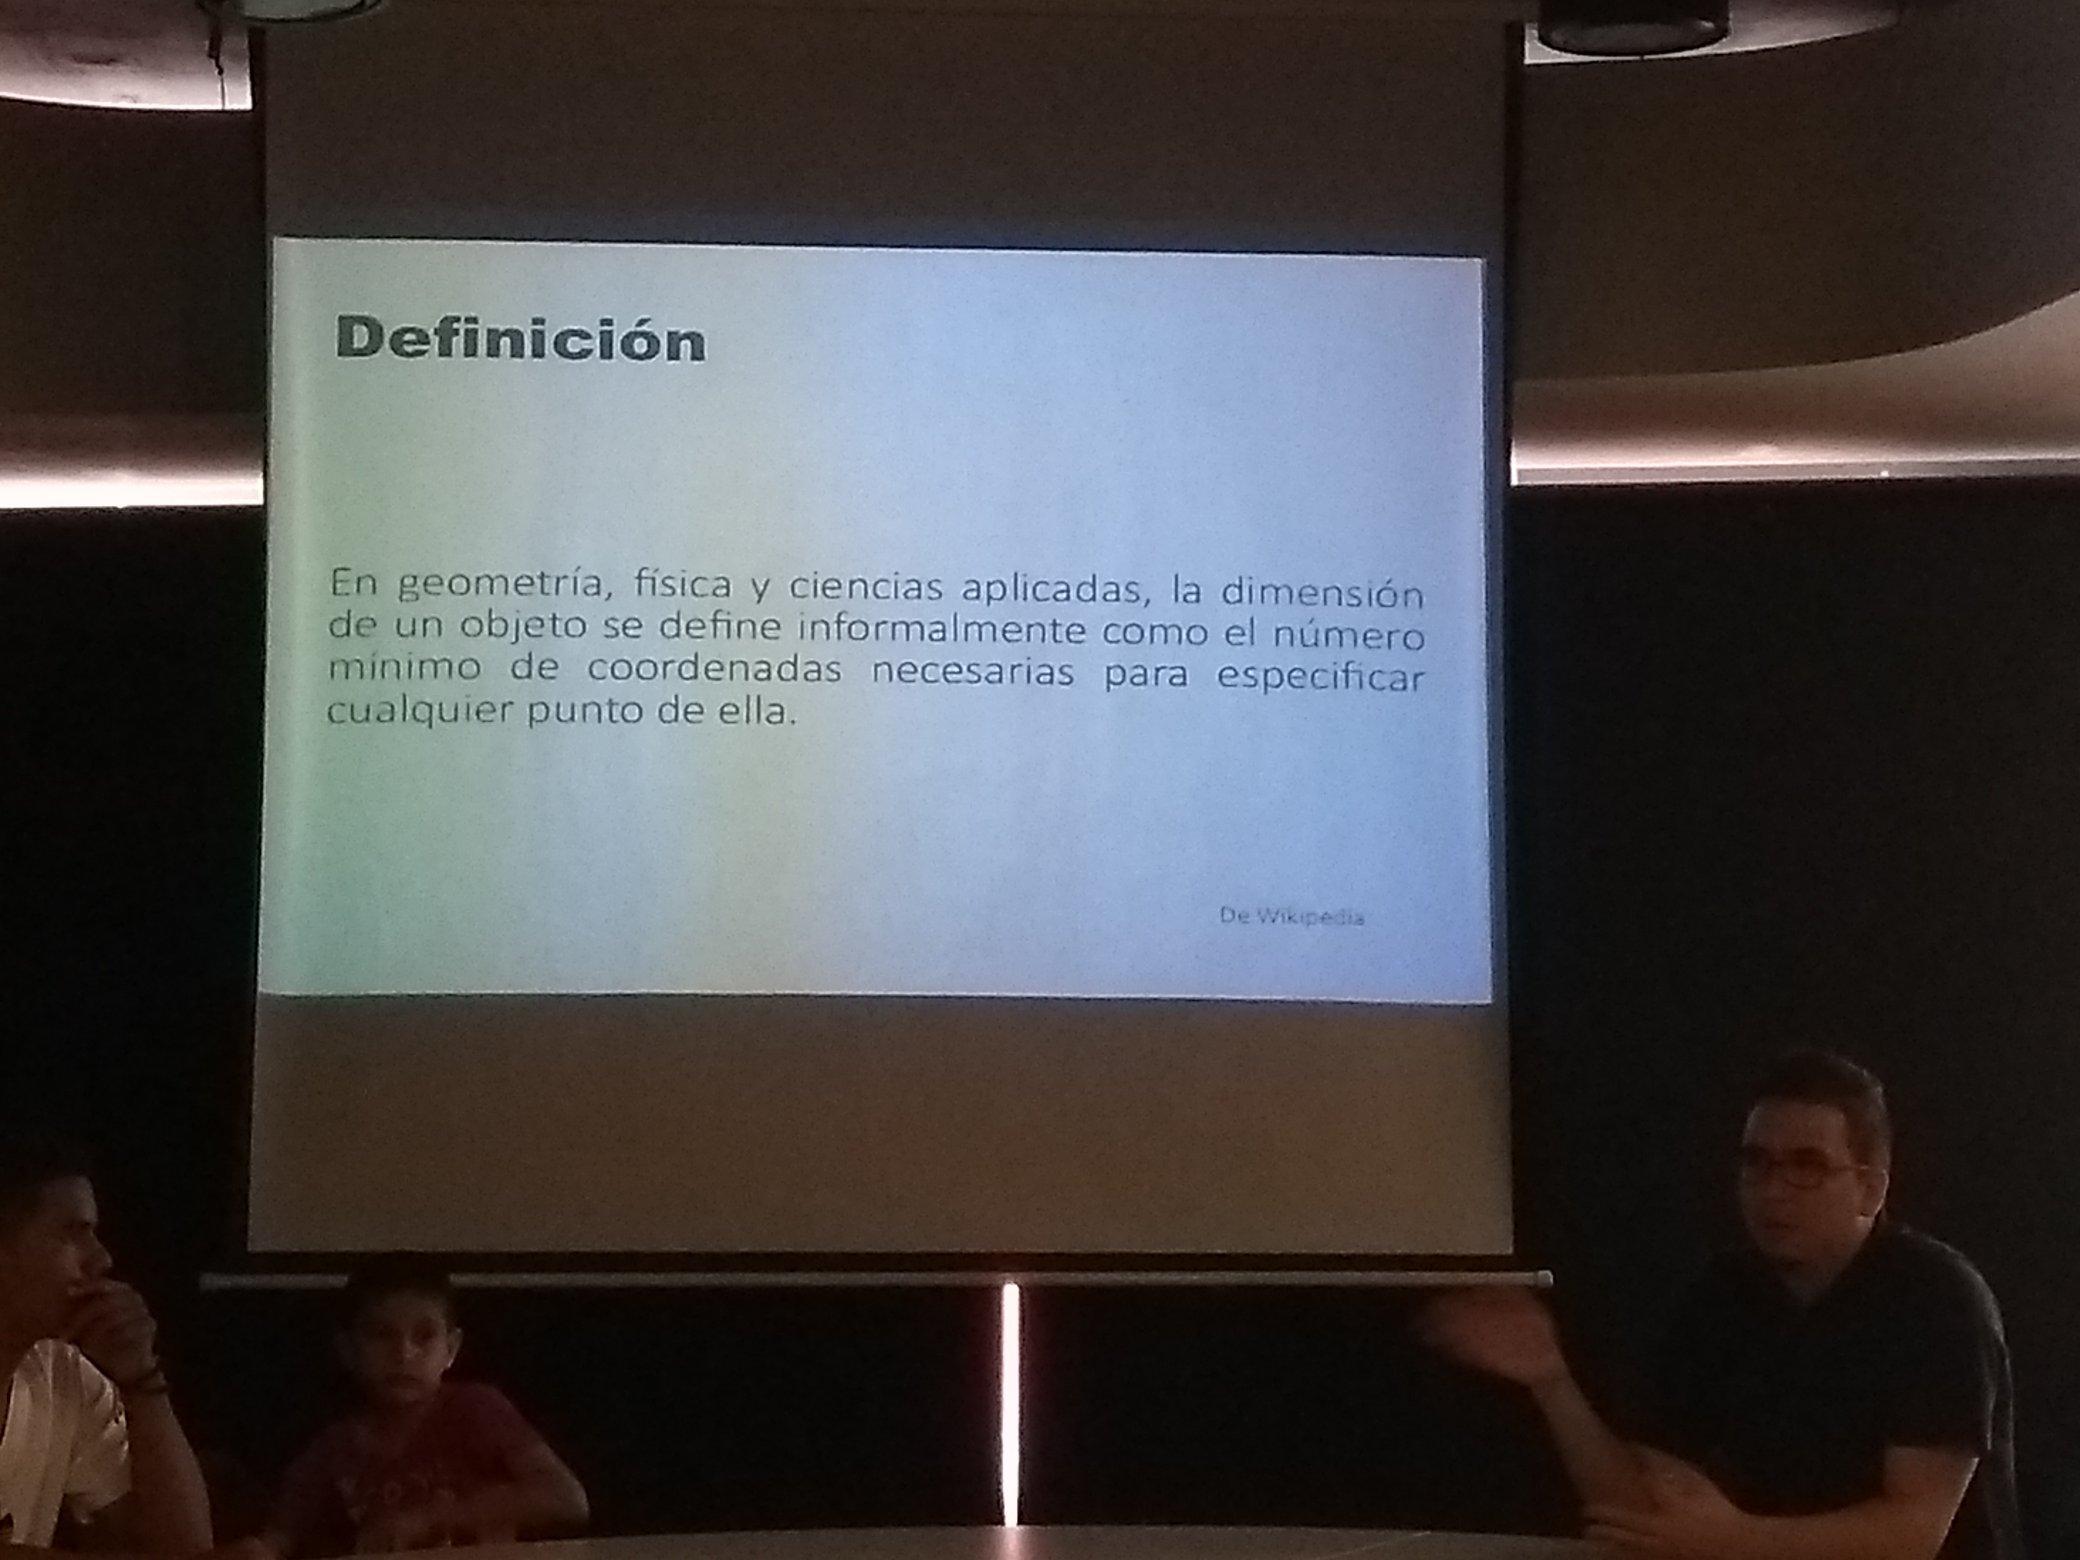 Diapositiva de definición de dimensión.